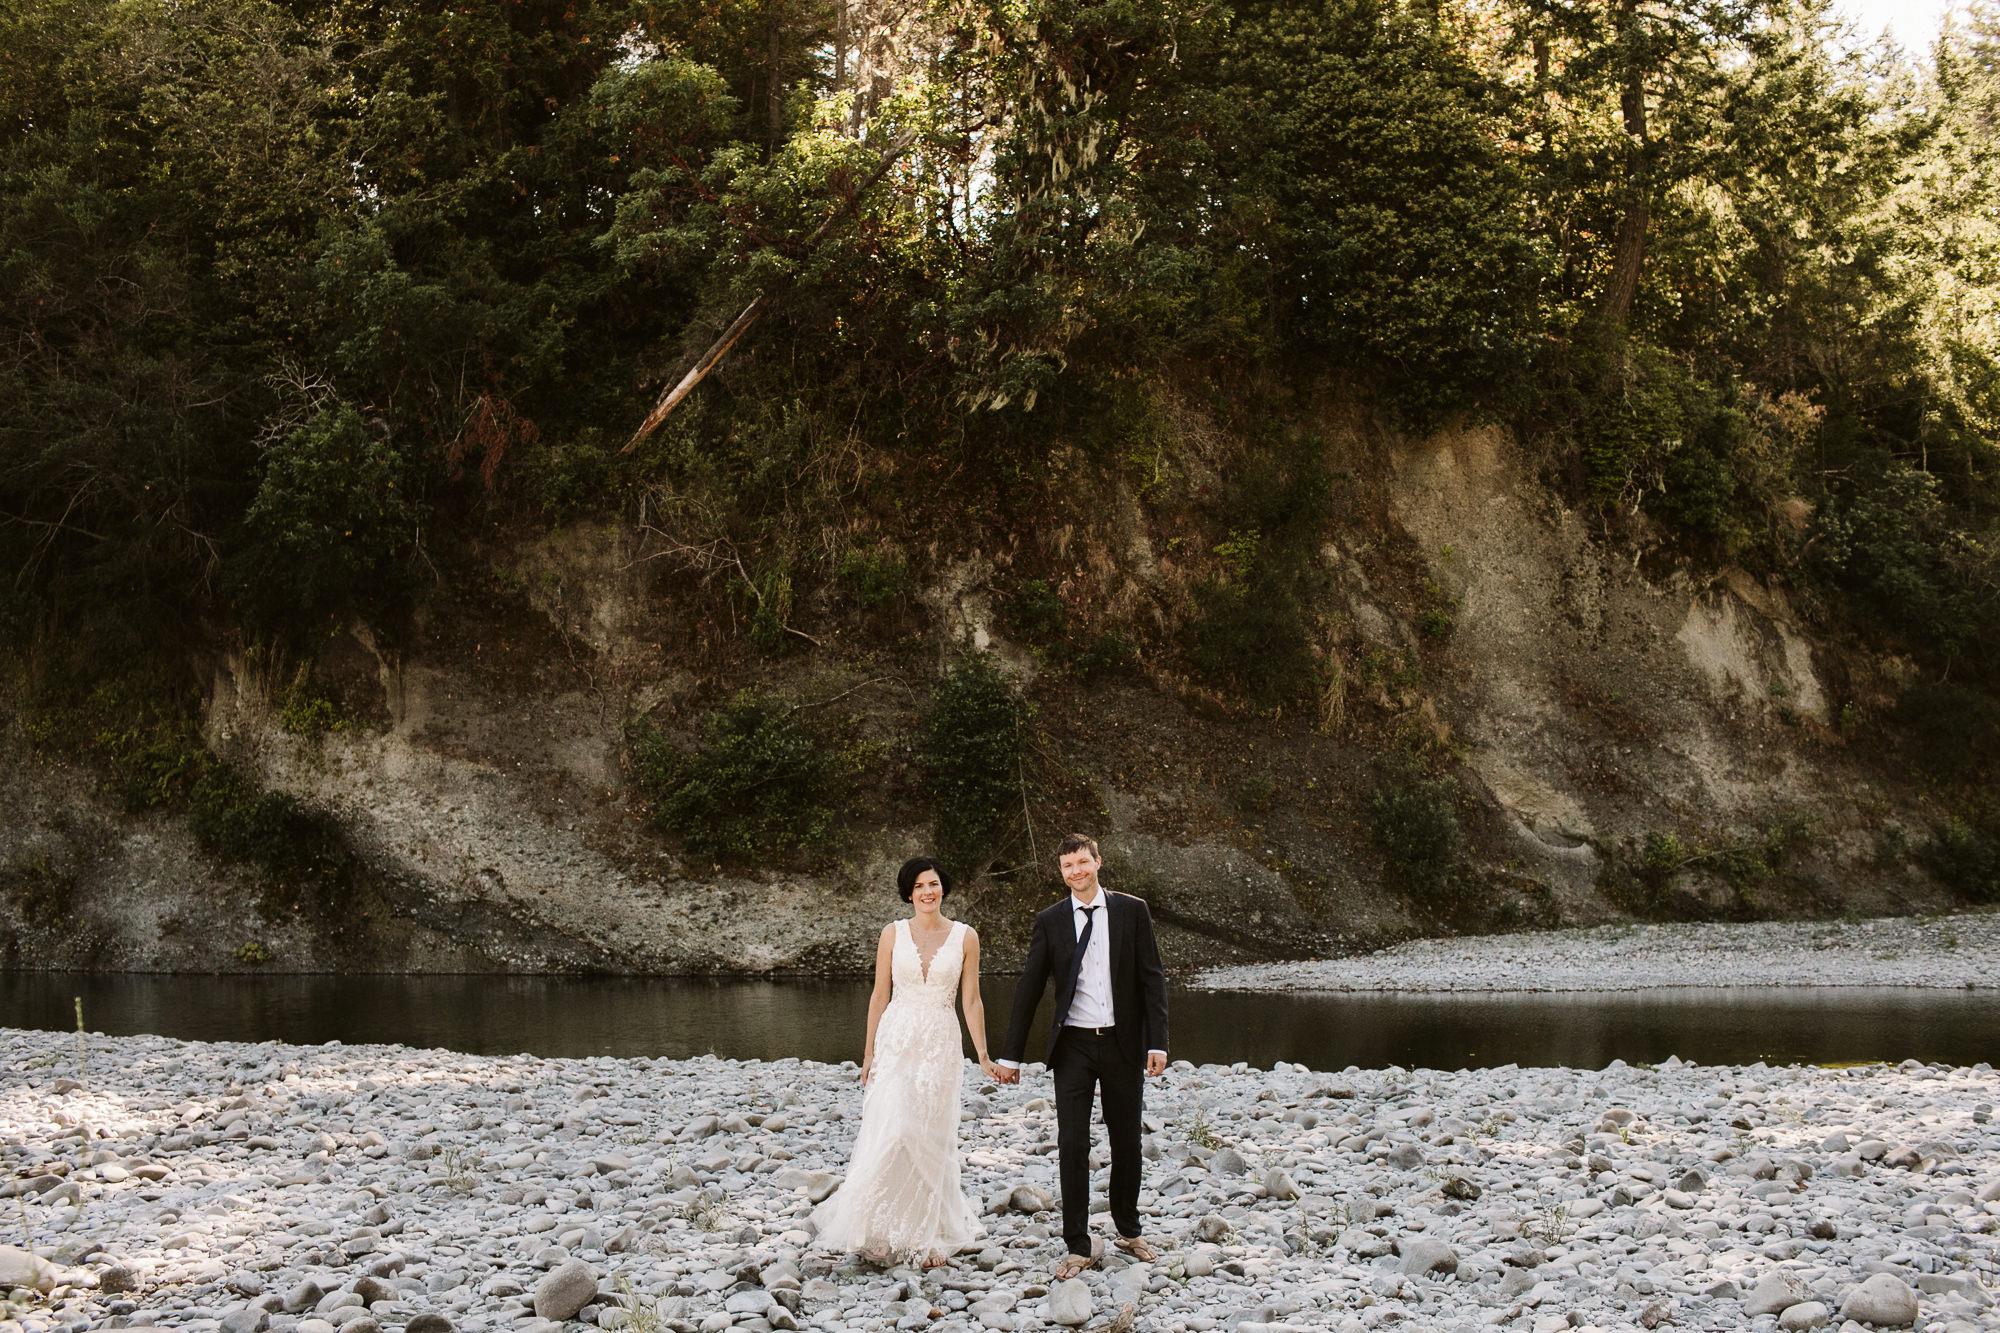 California-wedding-photographer-alfonso-flores-pamplin-groove-261.jpg